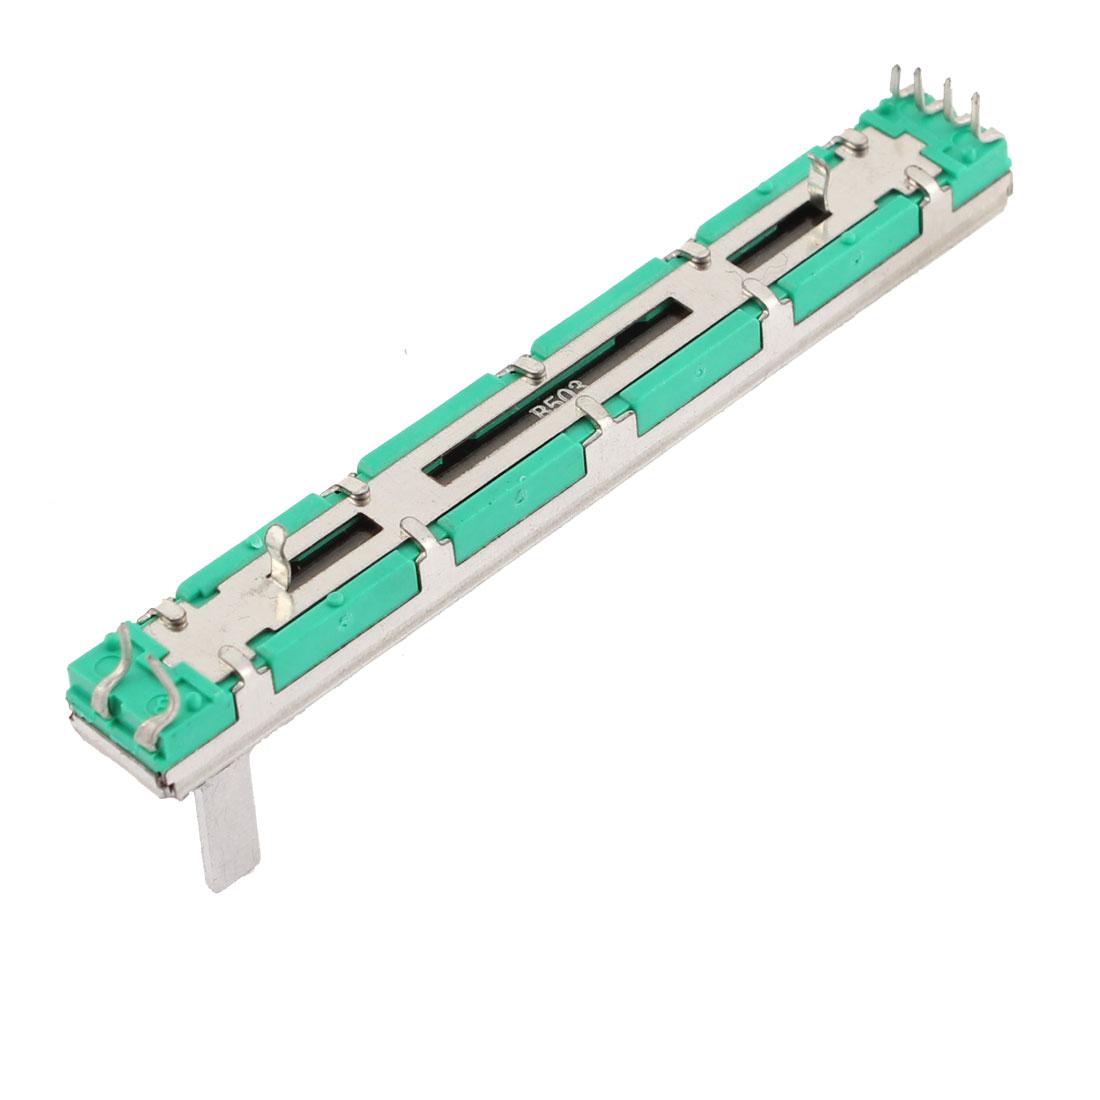 Audio Mixer Pusher 8 Pins 65mm Travel Straight Slide Potentiometer 50K Ohm